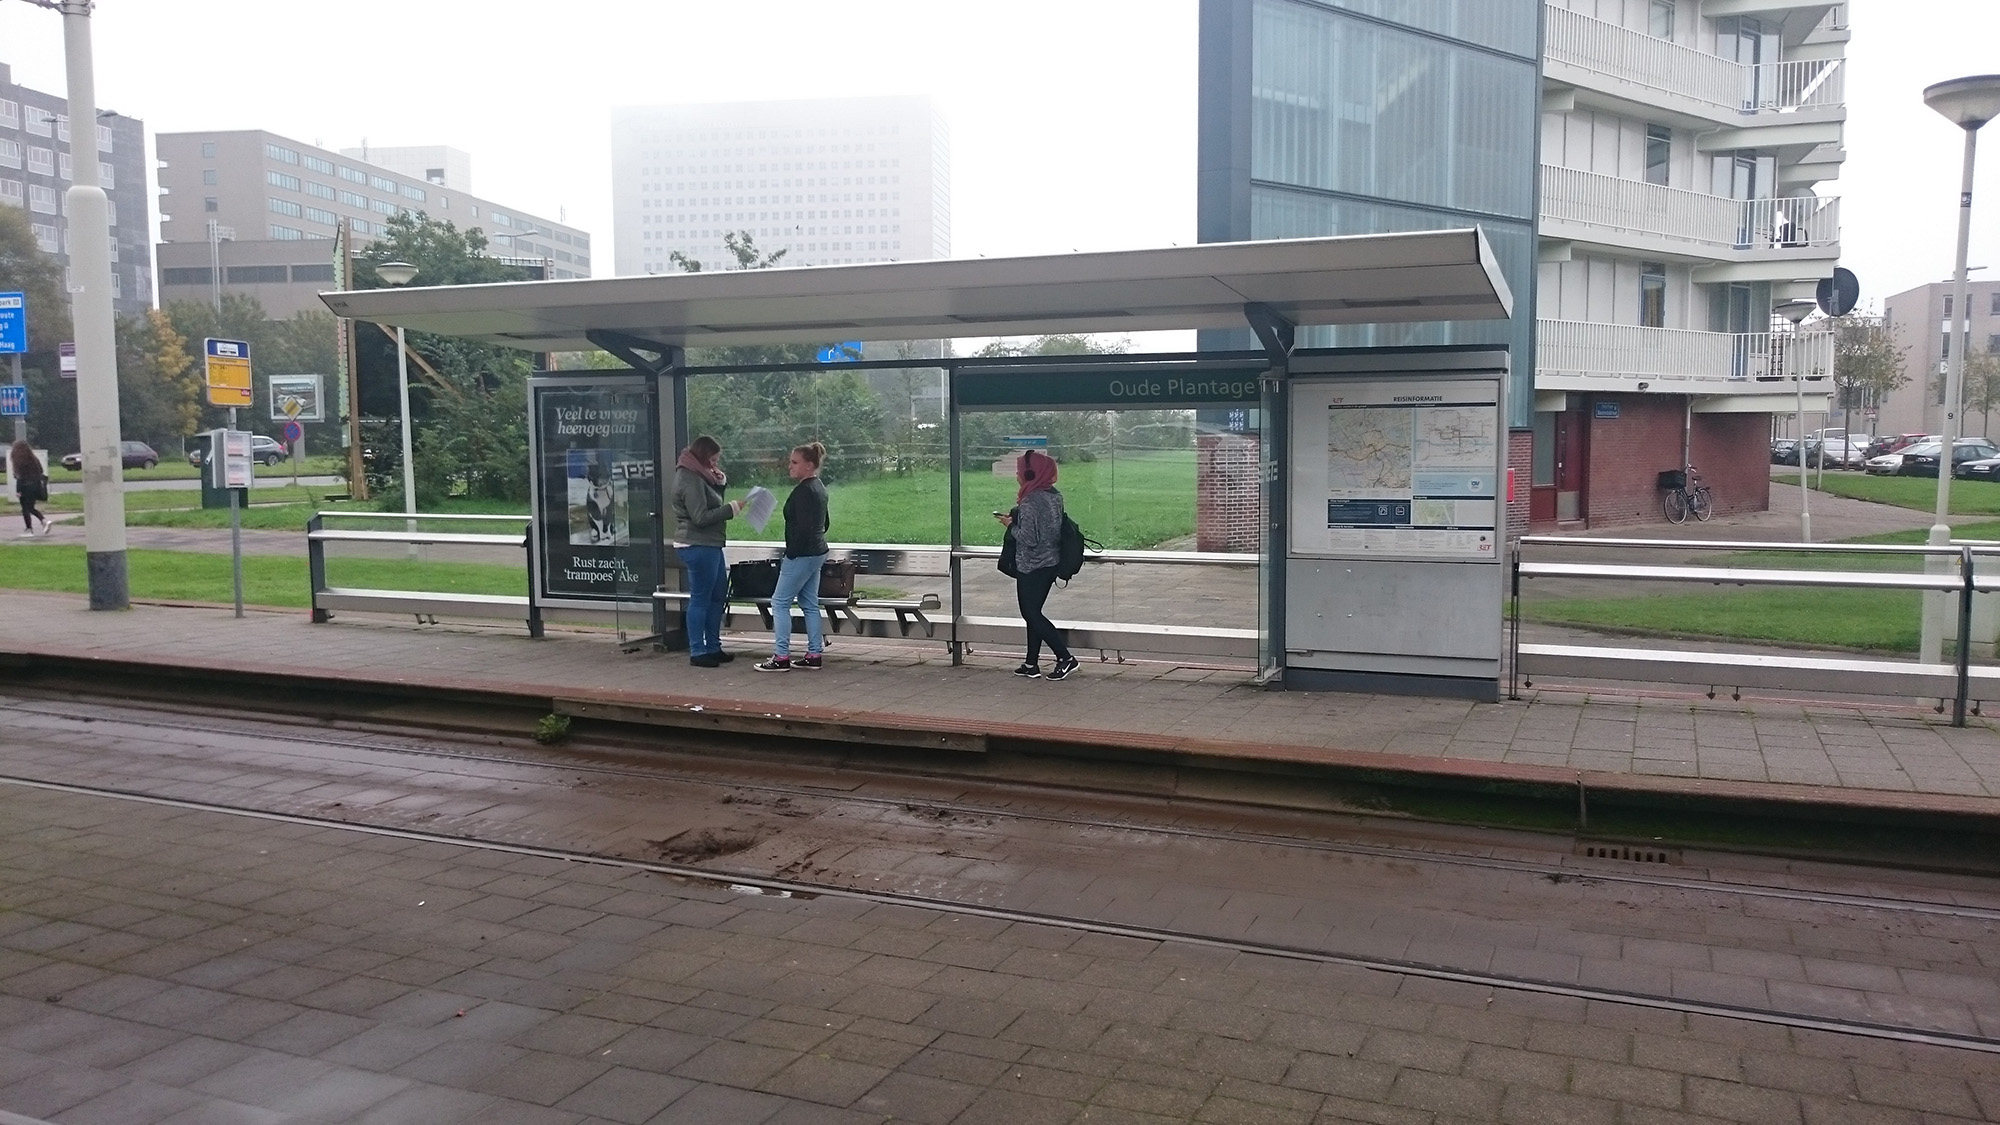 trampoes tramhalte oude plantage rouwadvertentie (5)